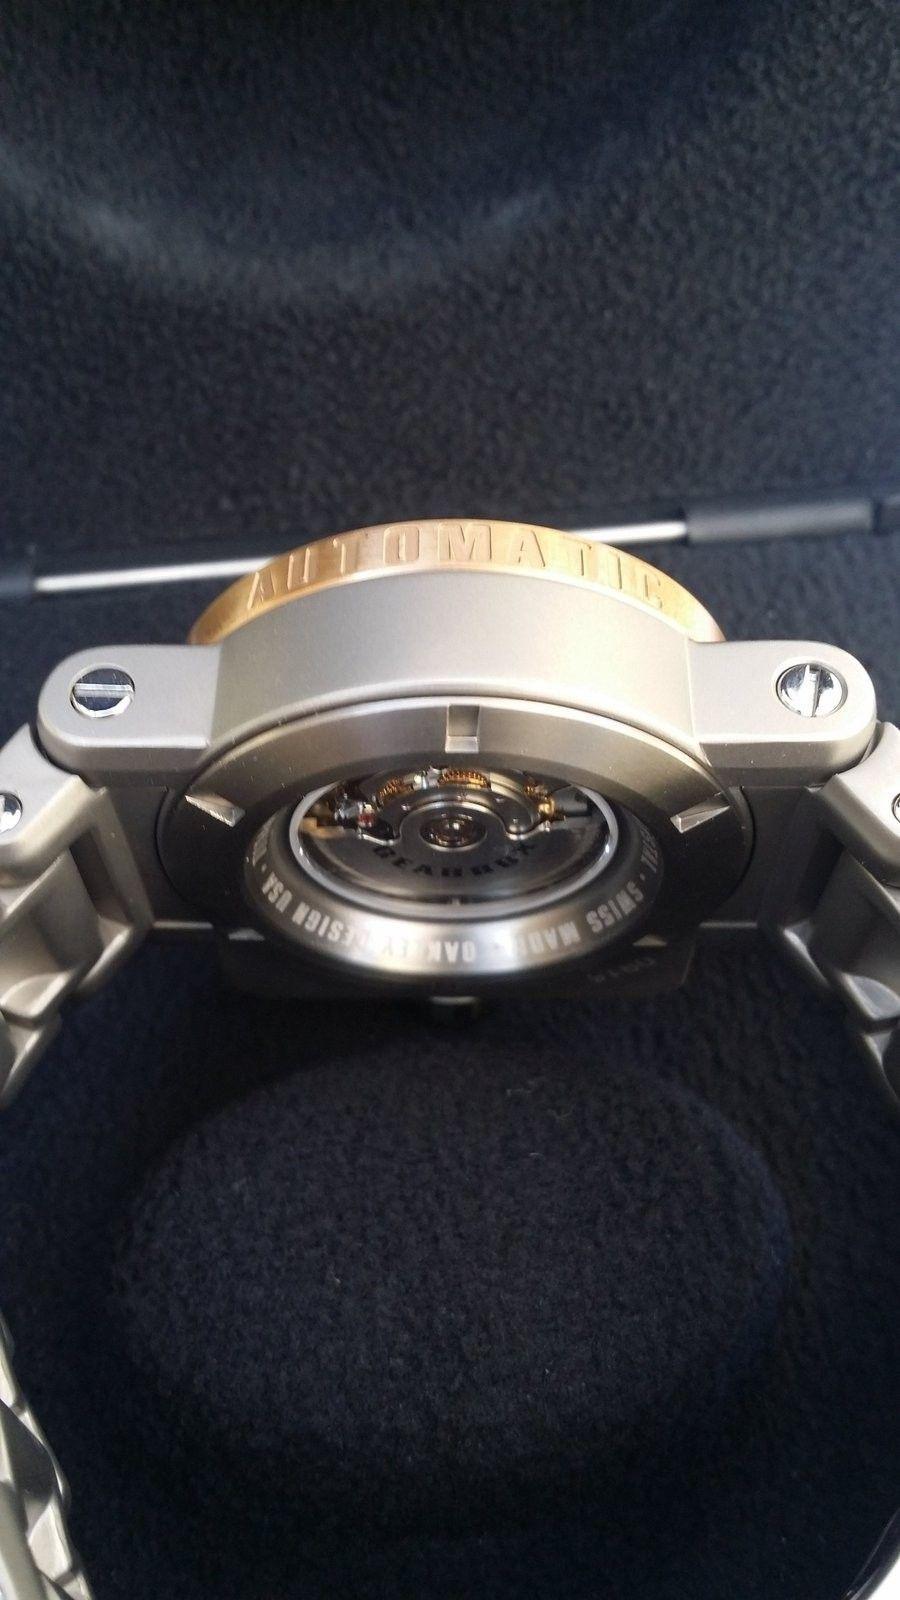 Gearbox Automatic Bracelet - 20150829_090440.jpg